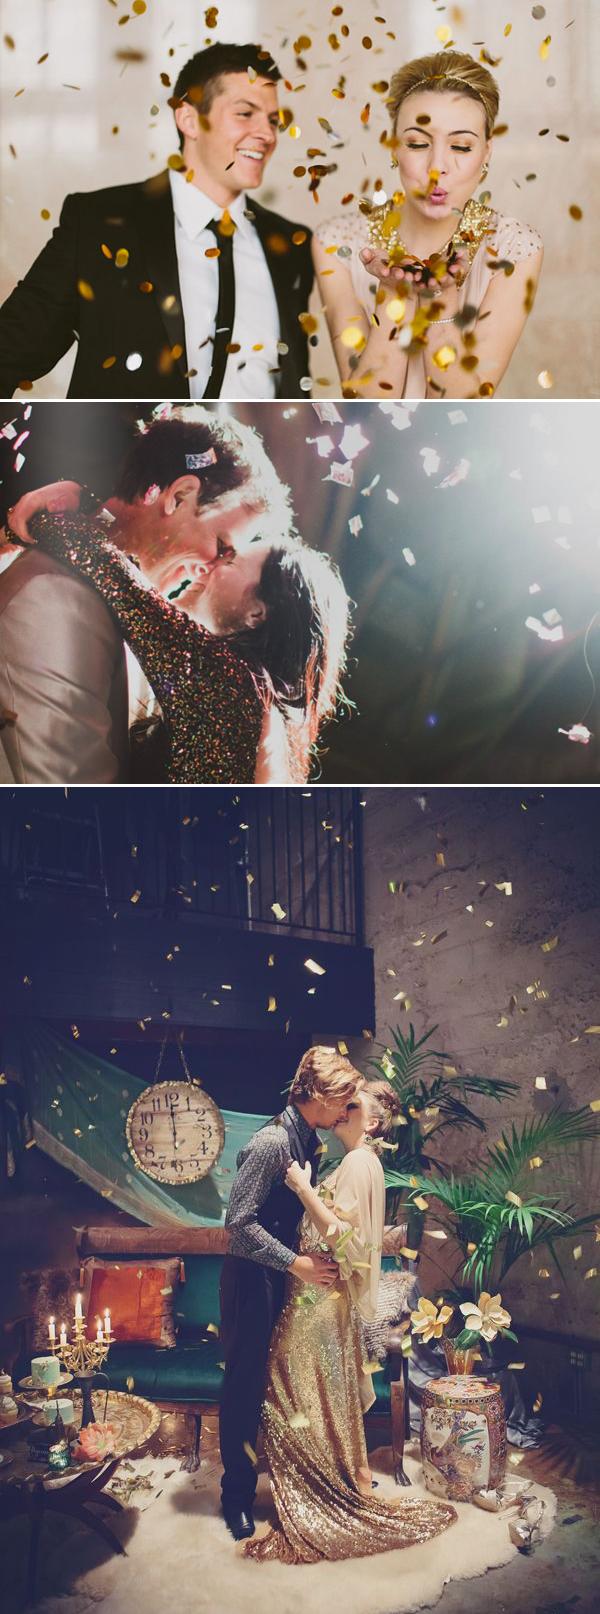 21 Cute New Year S Eve Couple Photo Ideas Praise Wedding